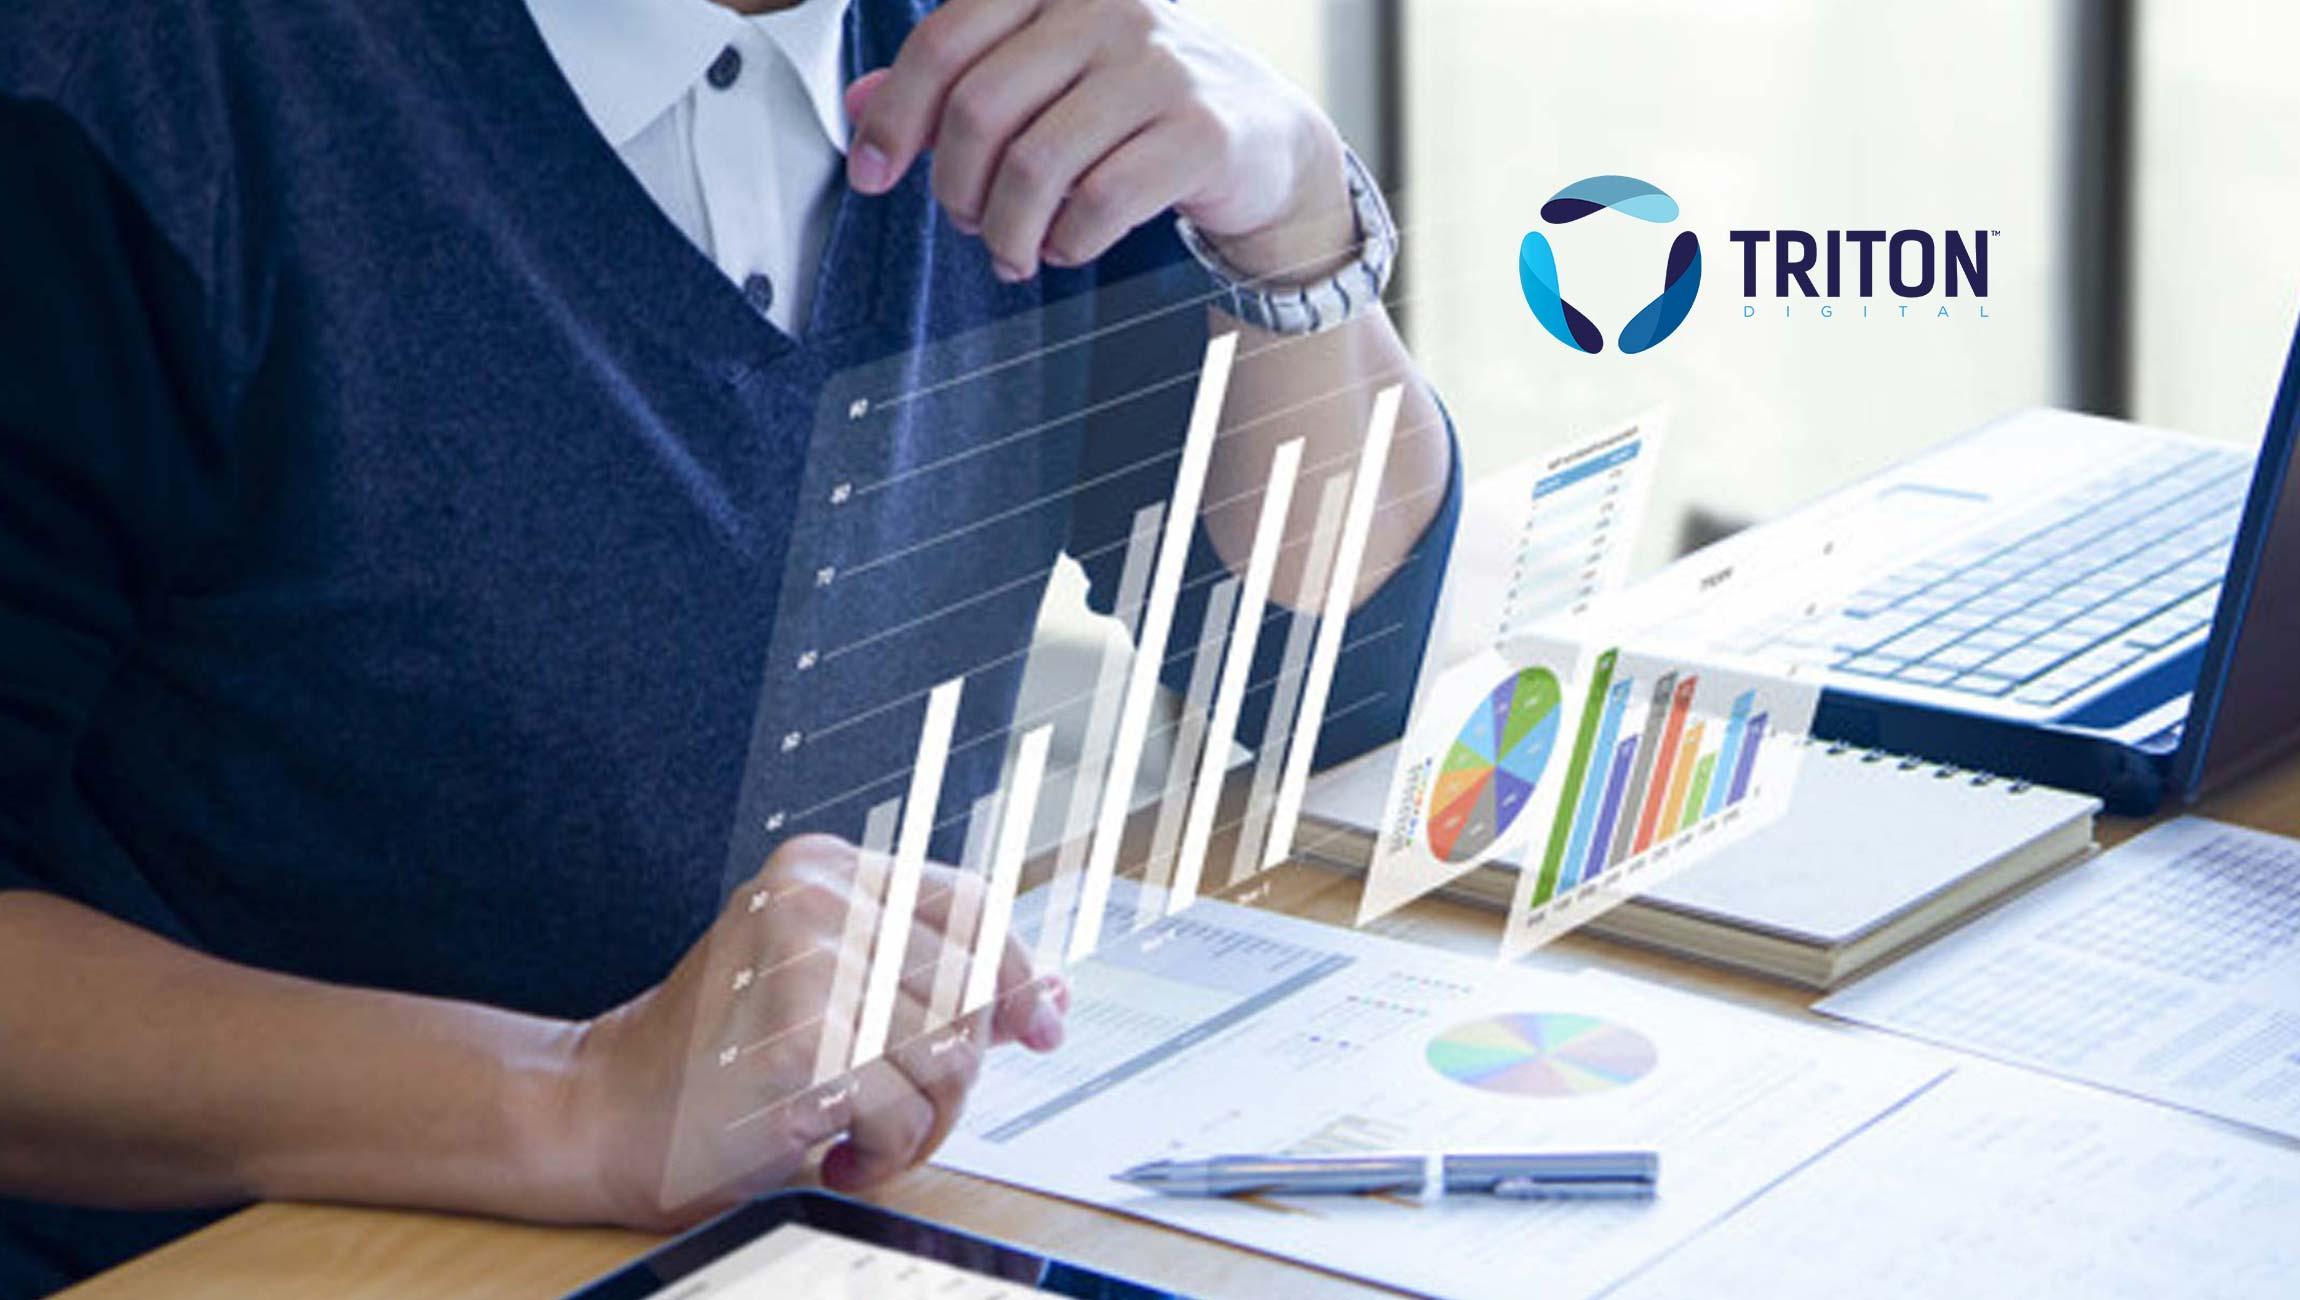 Triton Digital Upgrades Omny Studio With New Content Reporting and Custom Metadata Capabilities